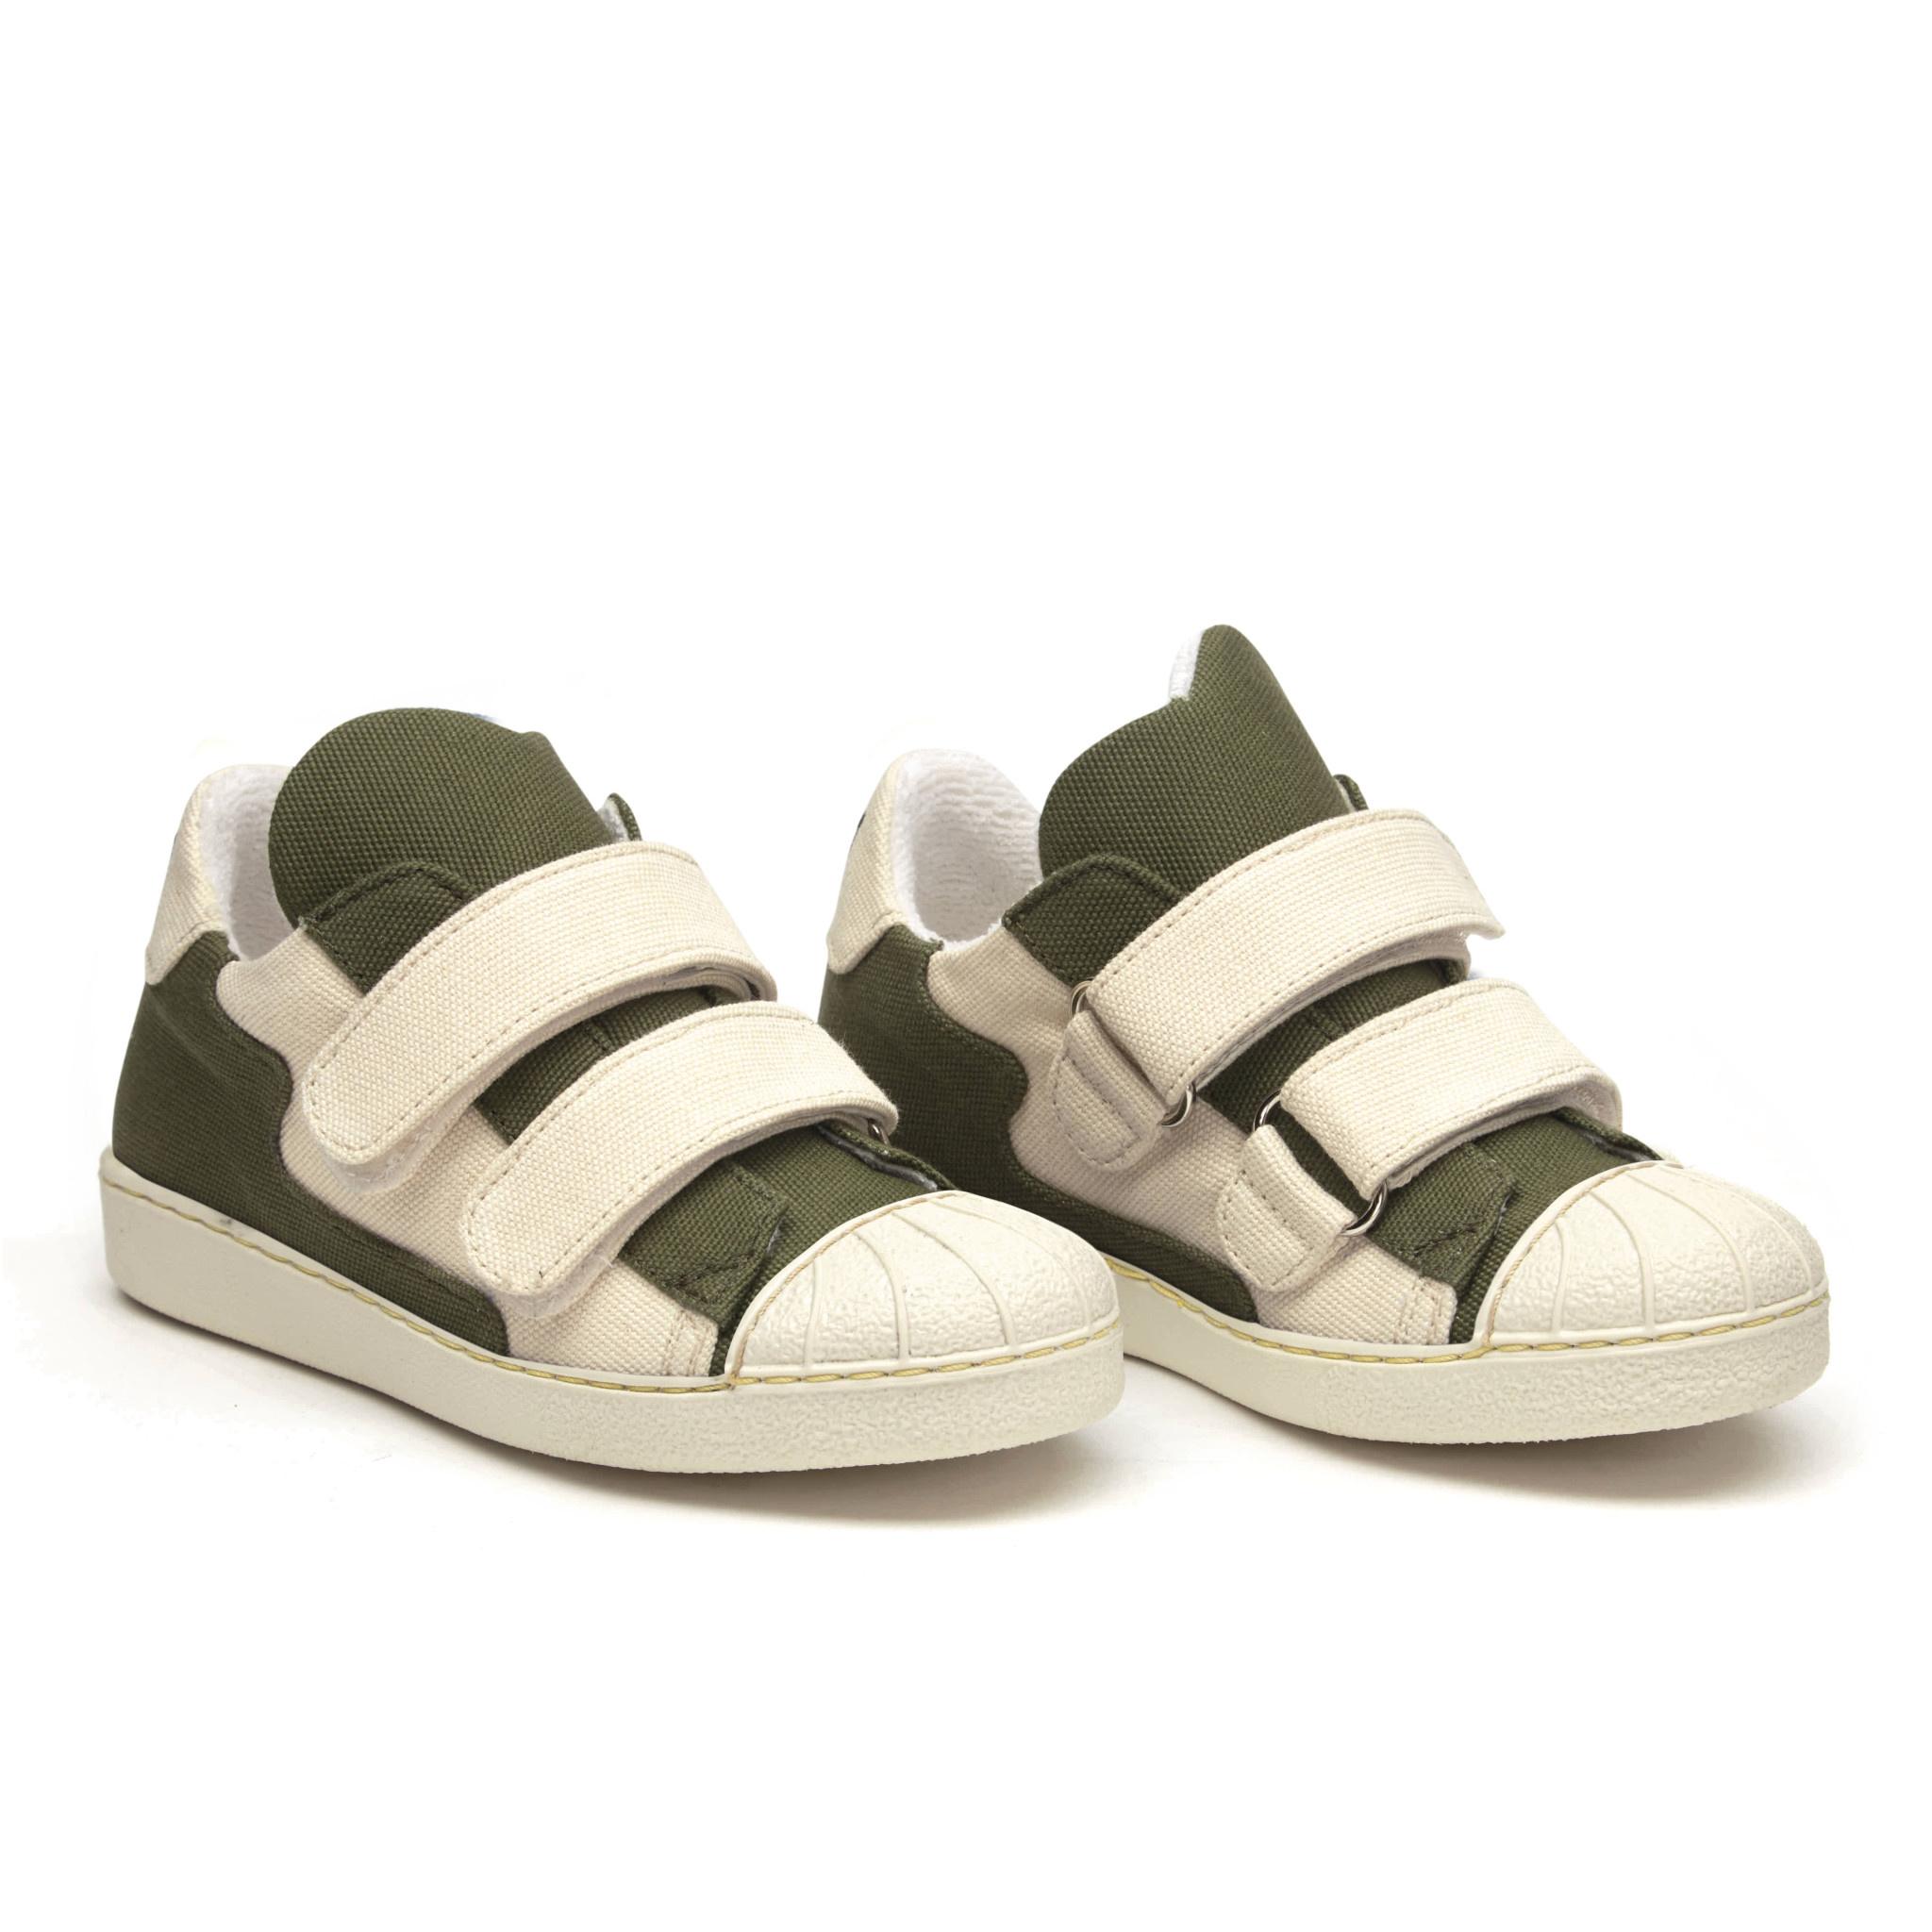 Bear & Mees Organic sneaker green